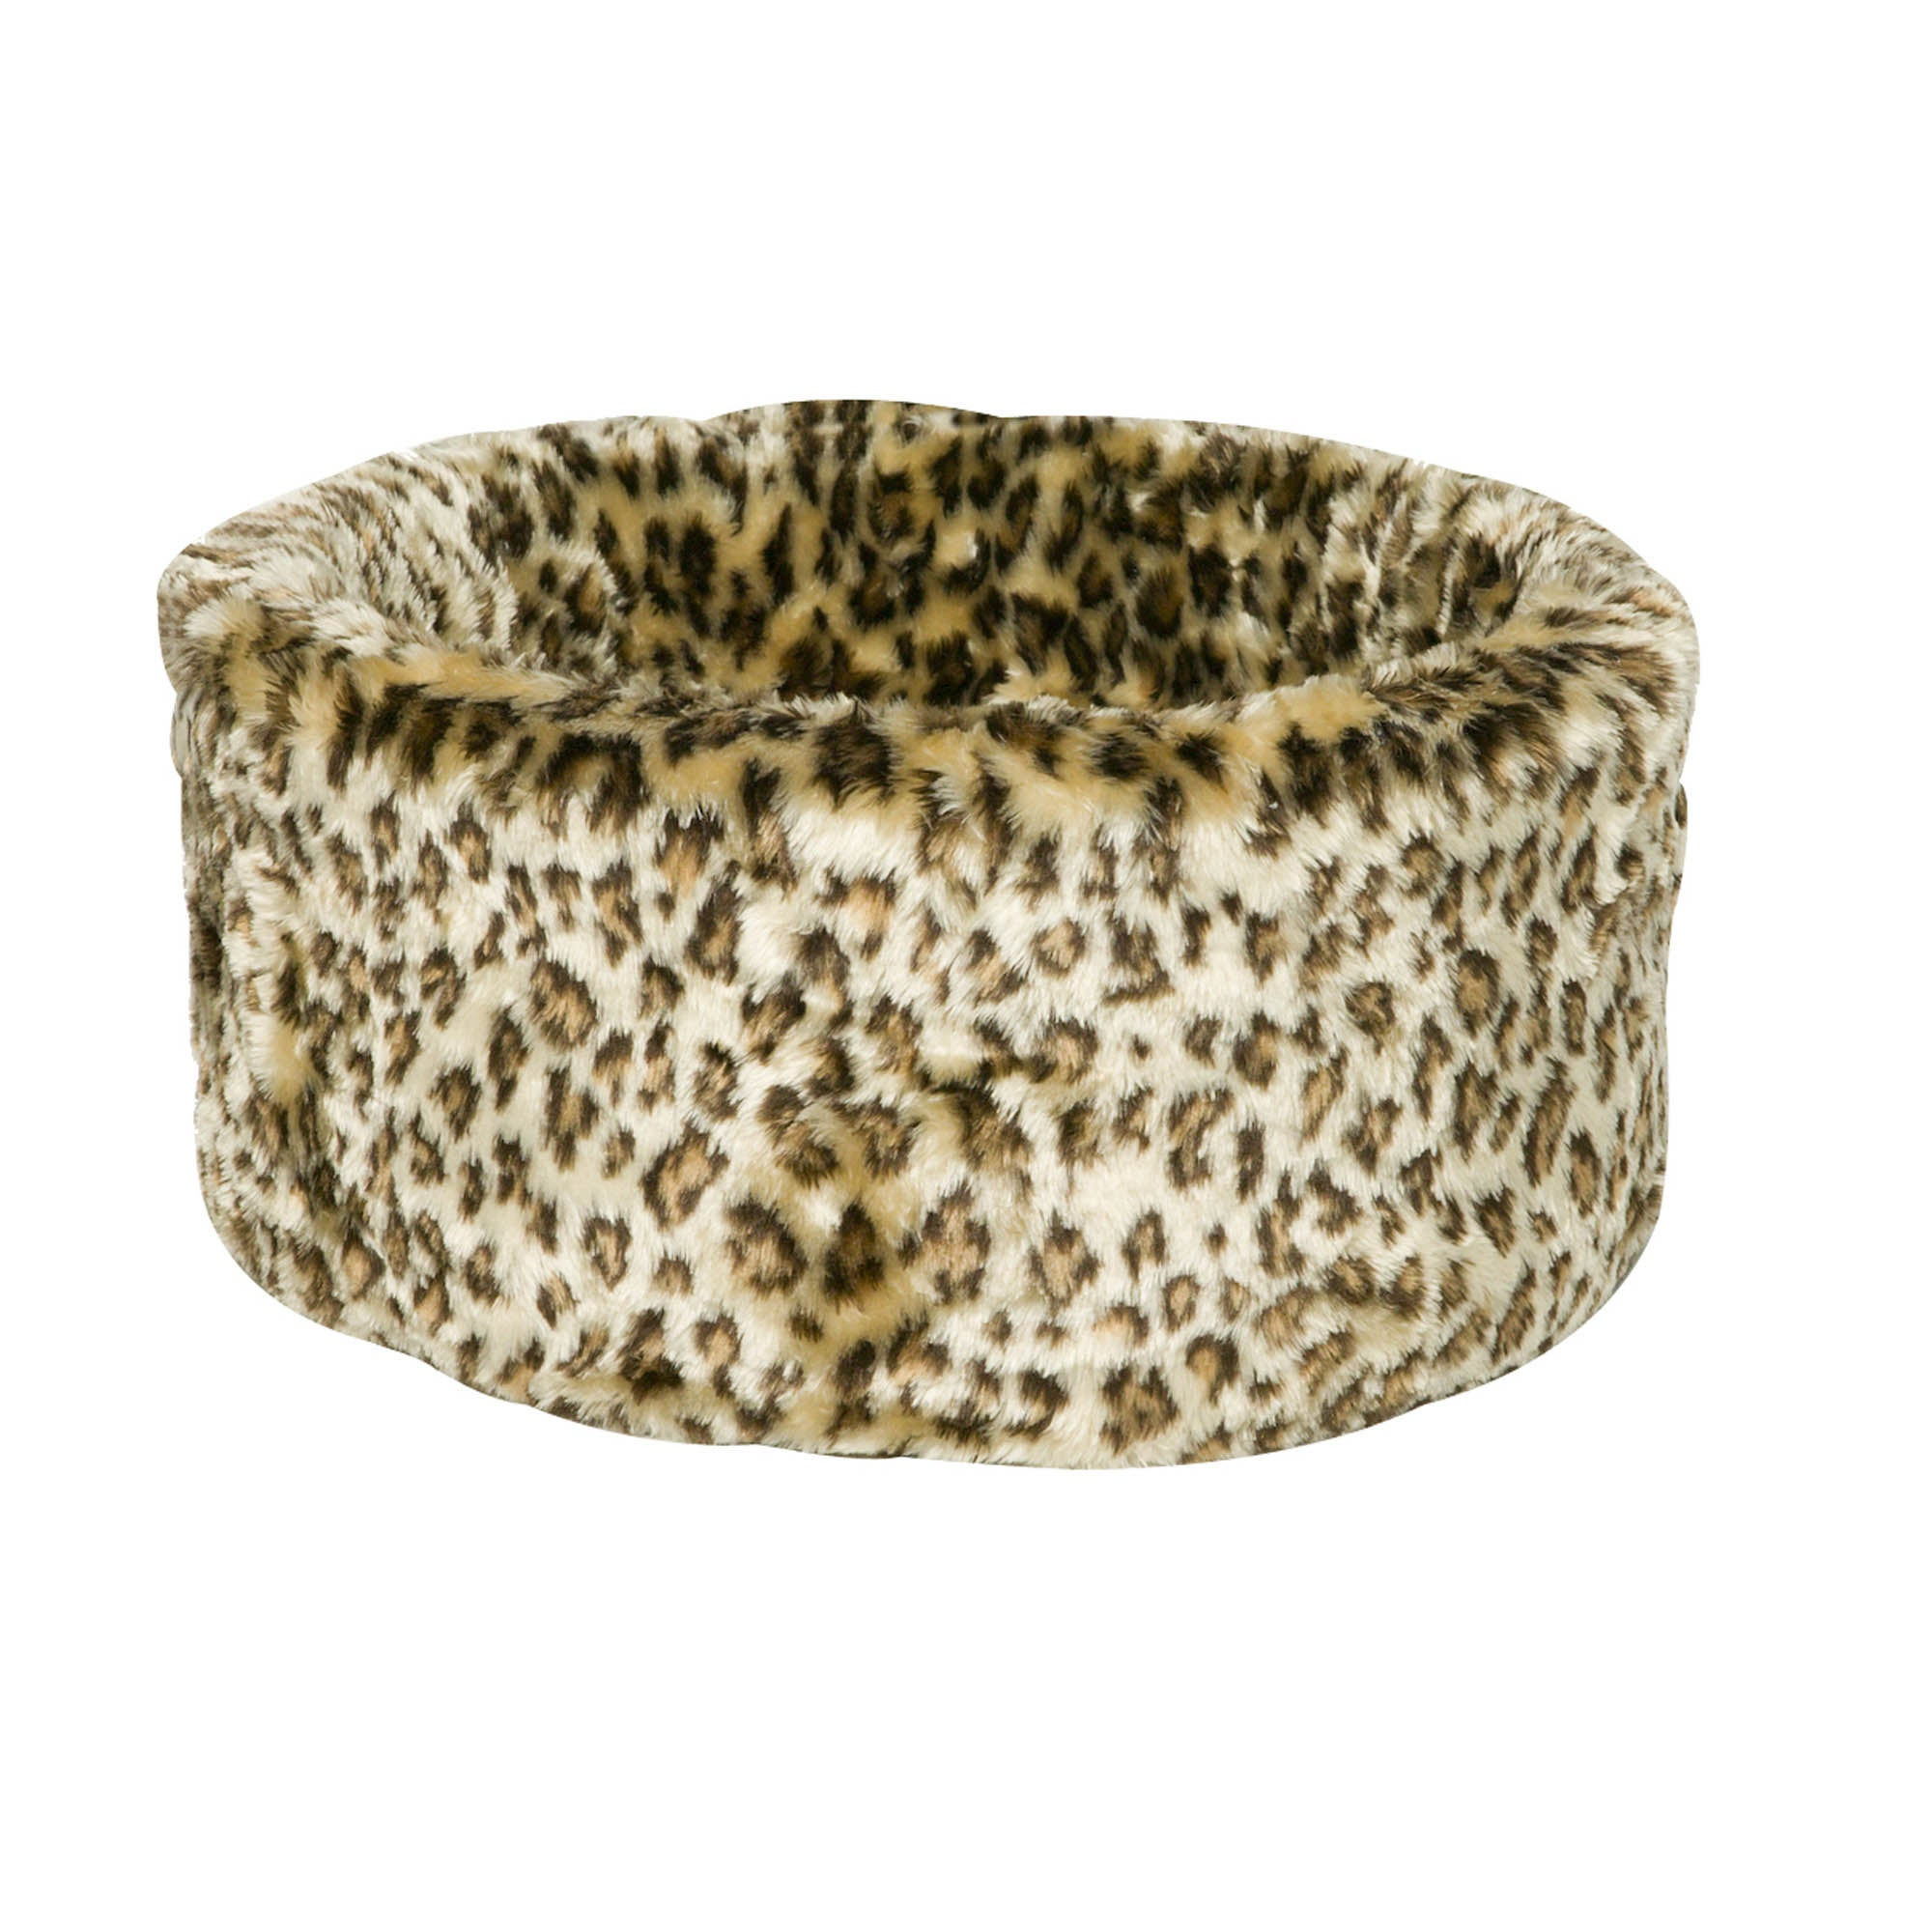 Photo of Leopard print cosy cat bed almond -cream-